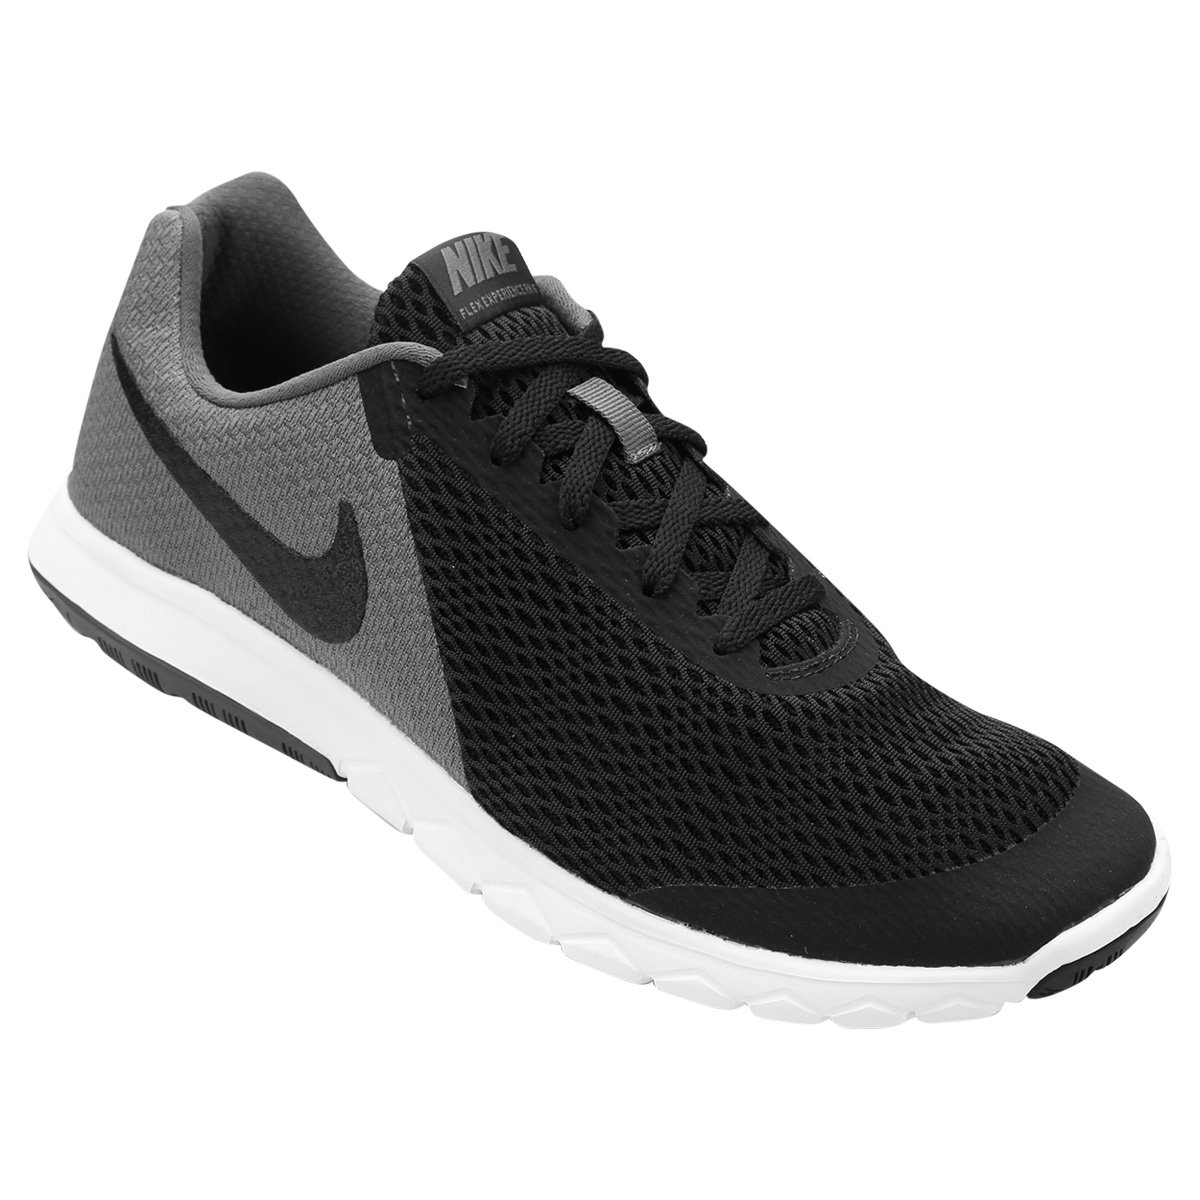 df75f8c5159 Tênis Nike Flex Experience Rn 6 Masculino - Preto e Cinza - Compre Agora